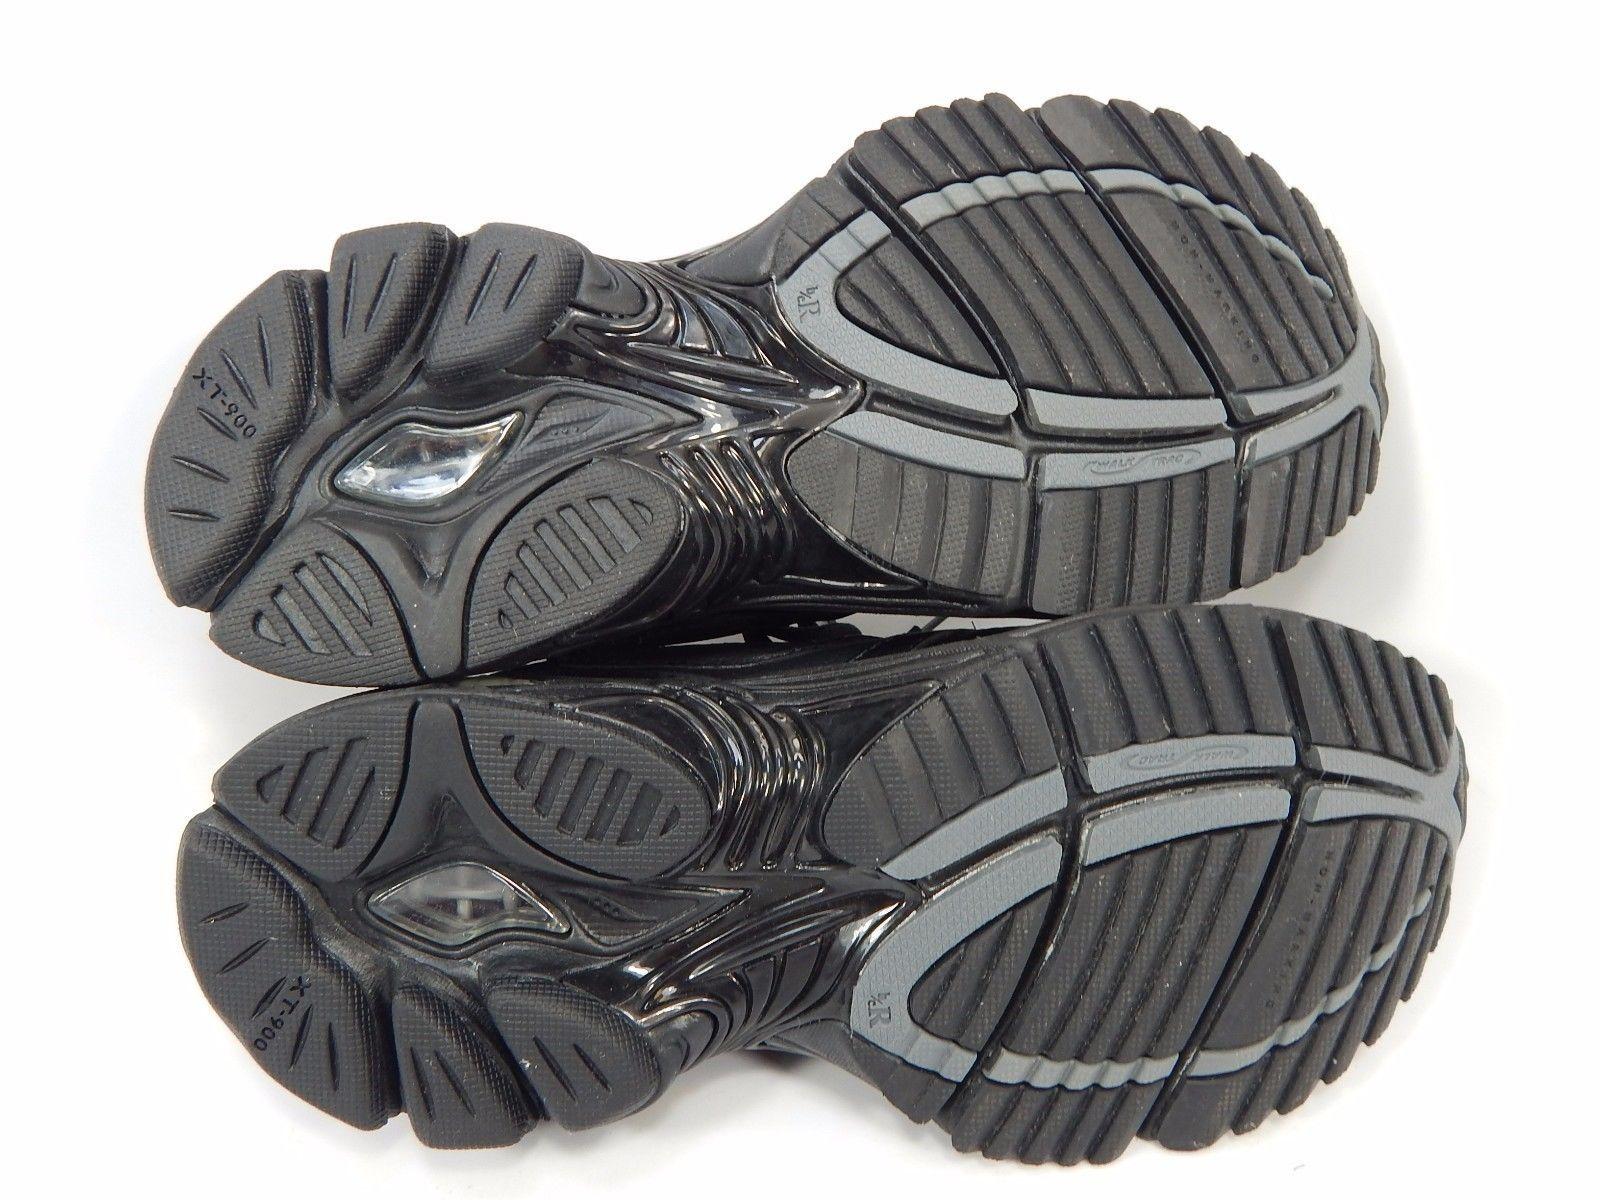 Saucony Omni Walker Women's Walking Shoes Size US 6 M (B) EU 37 Black 5260-2